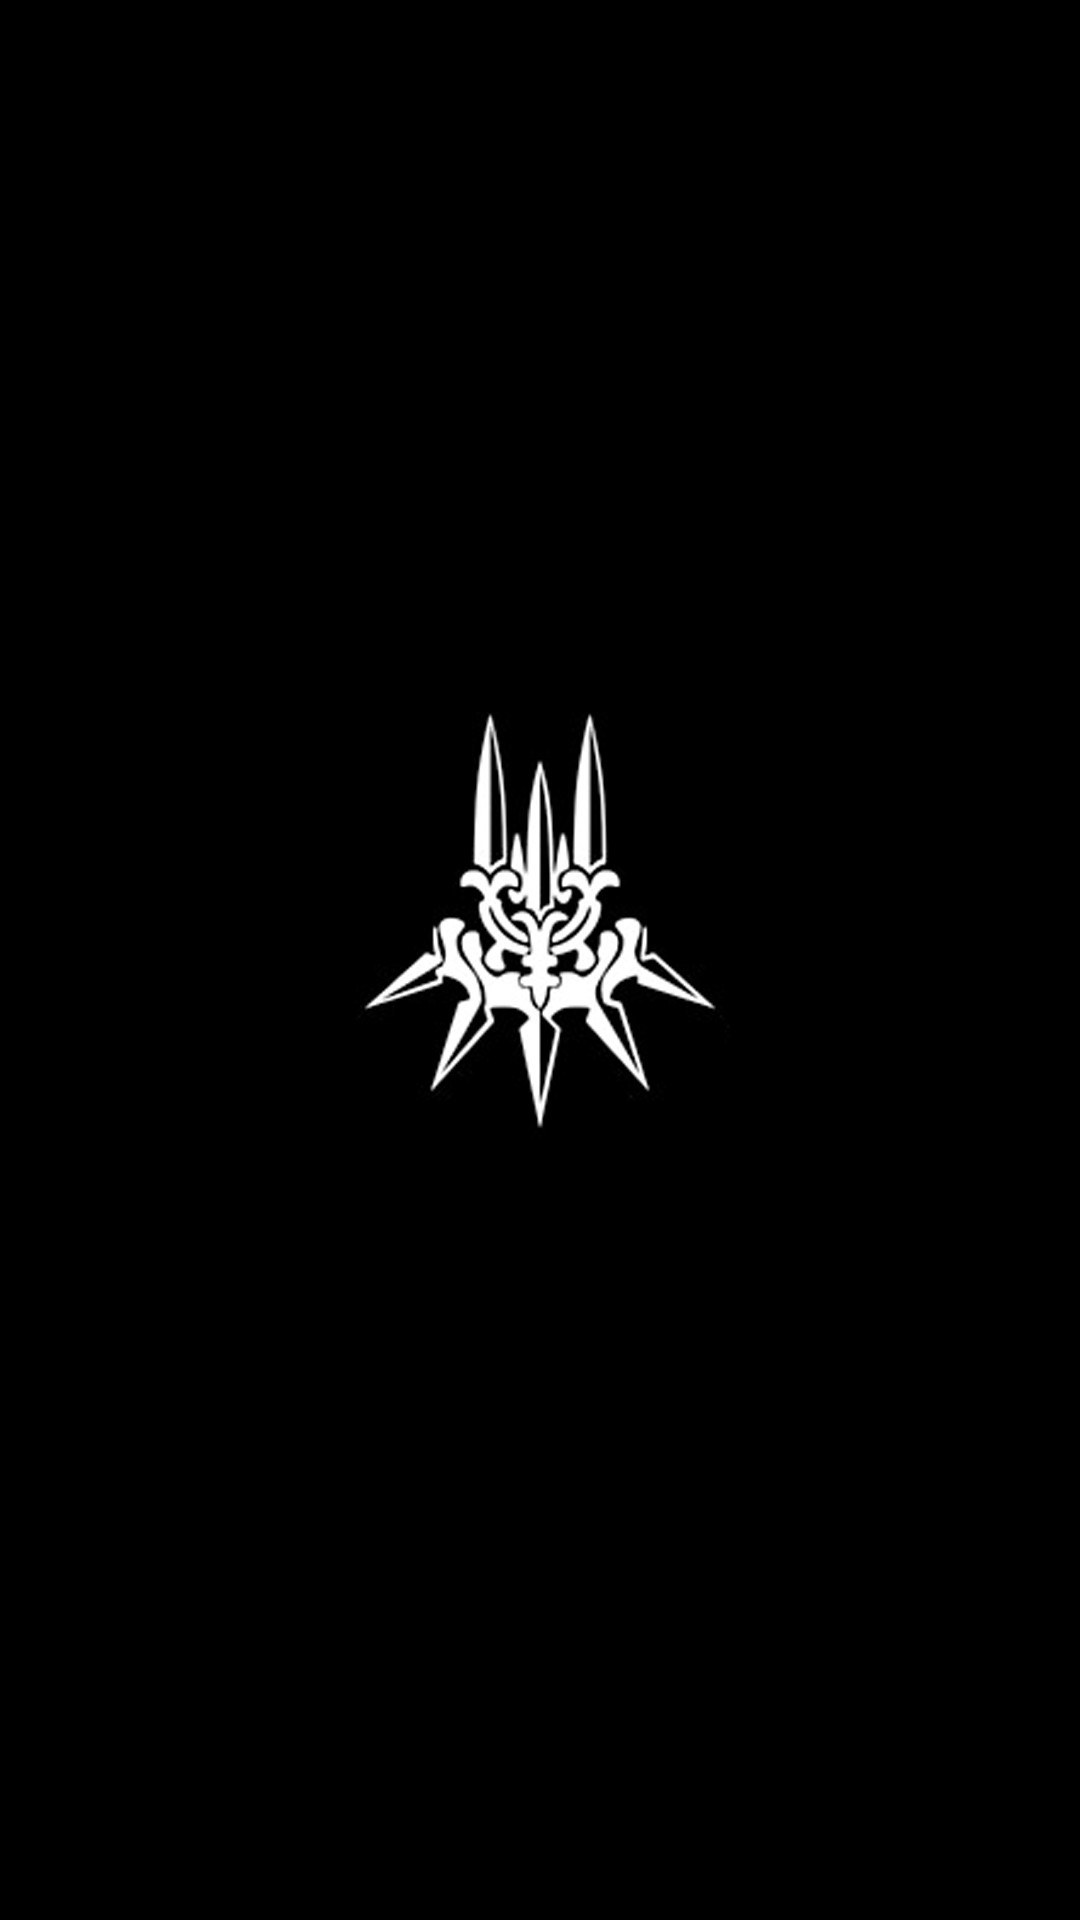 YoRHa emblem